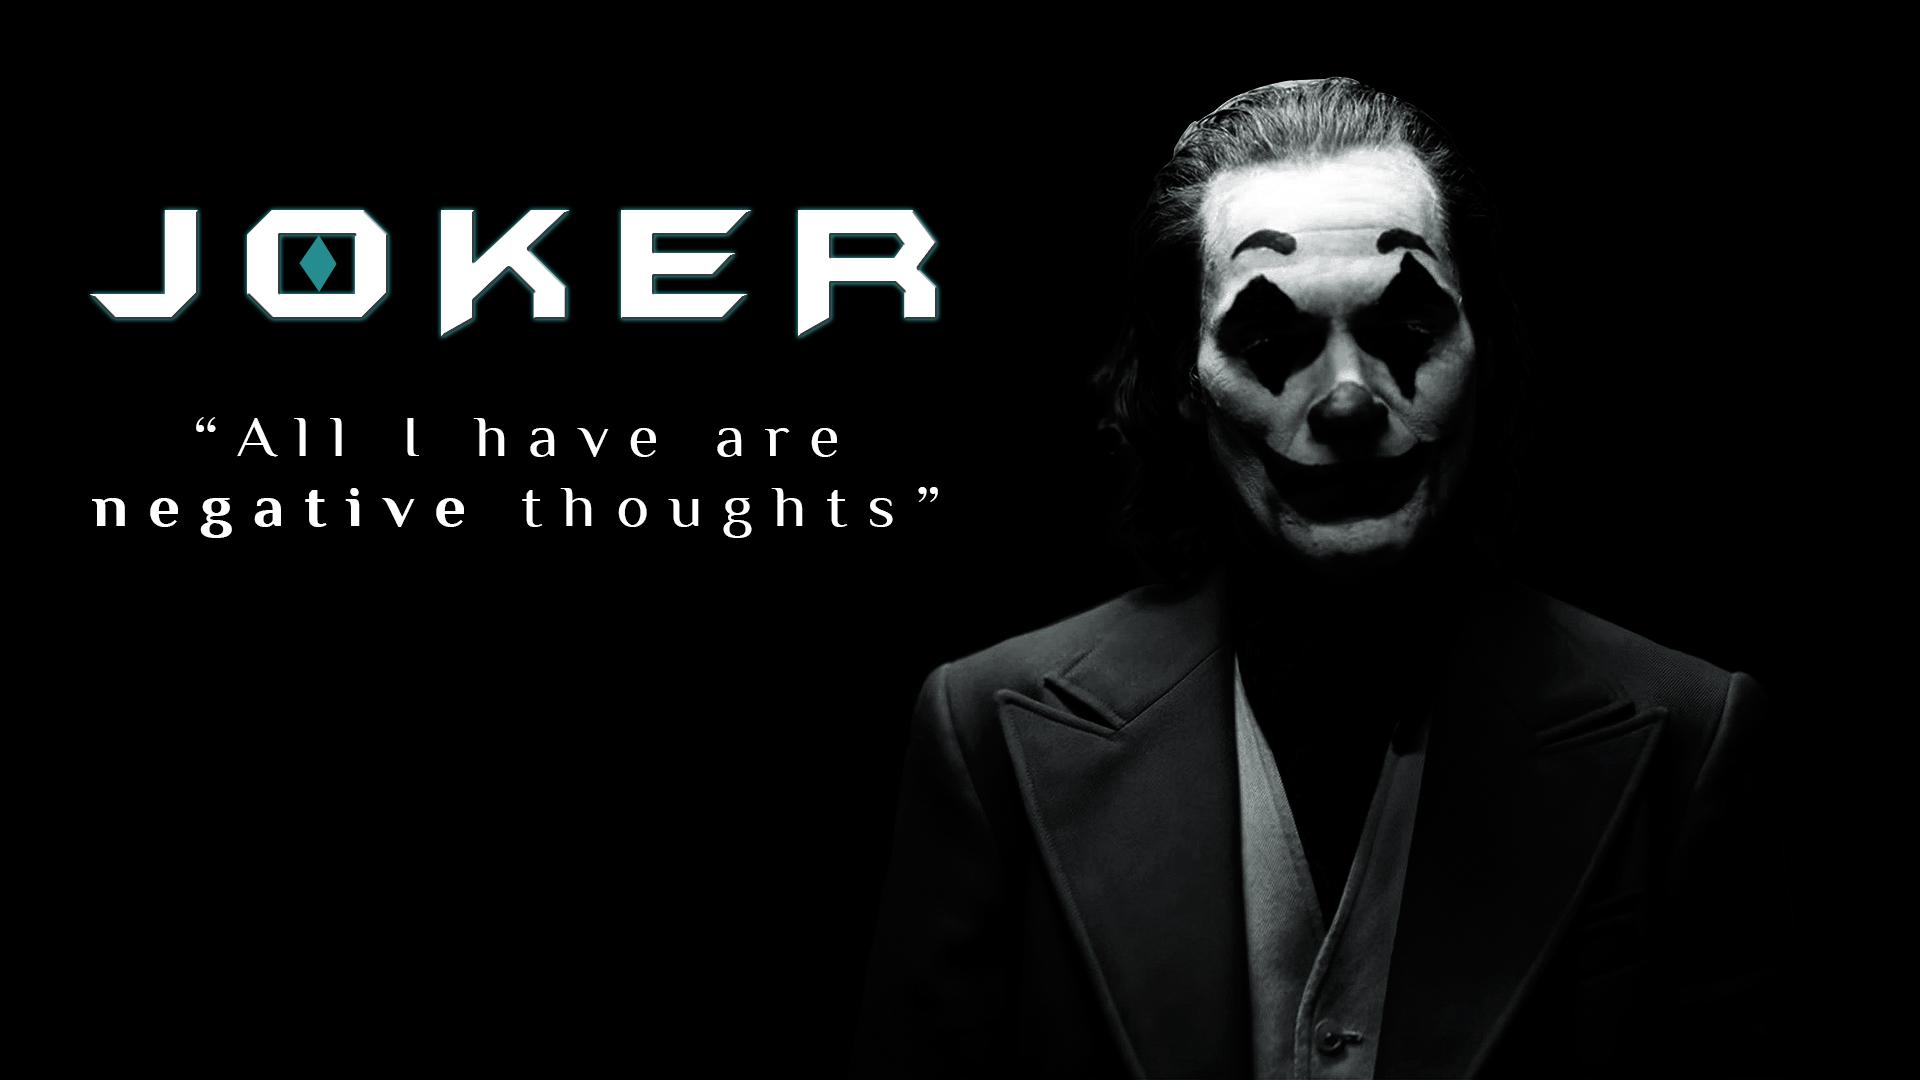 Movie Joker 1920x1080